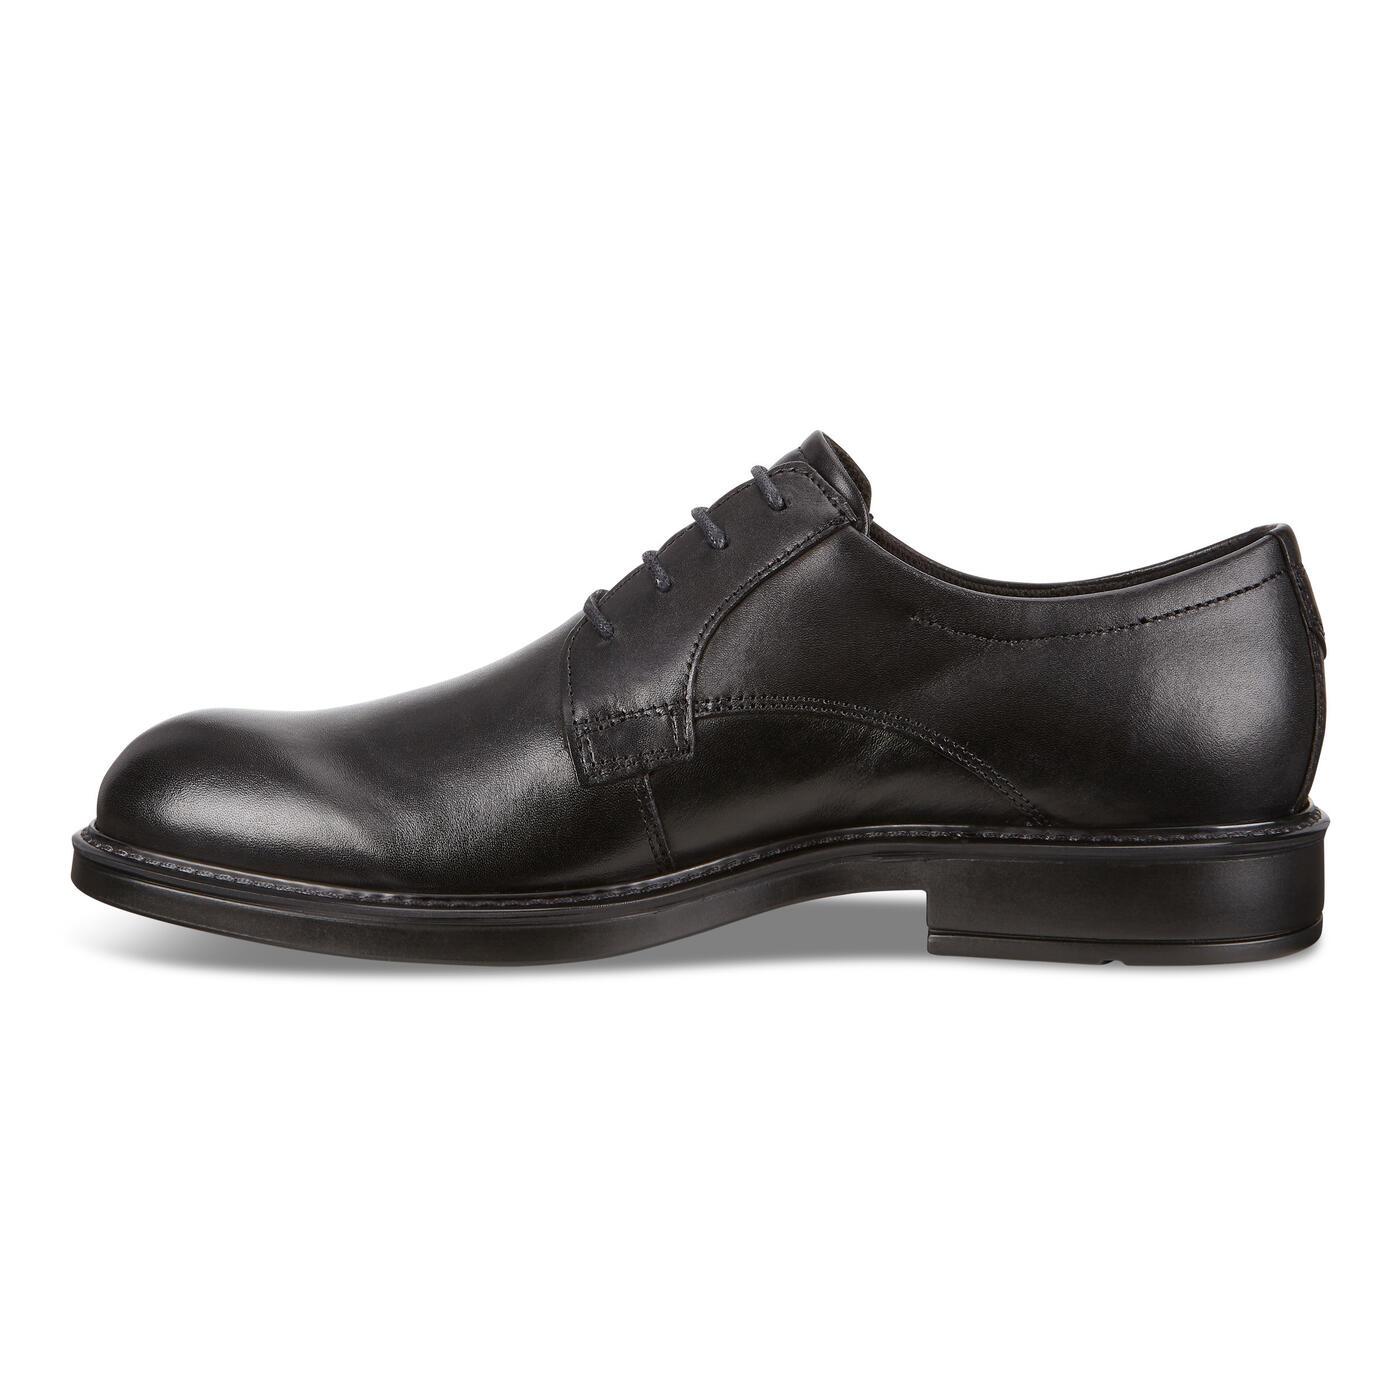 Chaussure ECCO Vitrus III Derby pour hommes